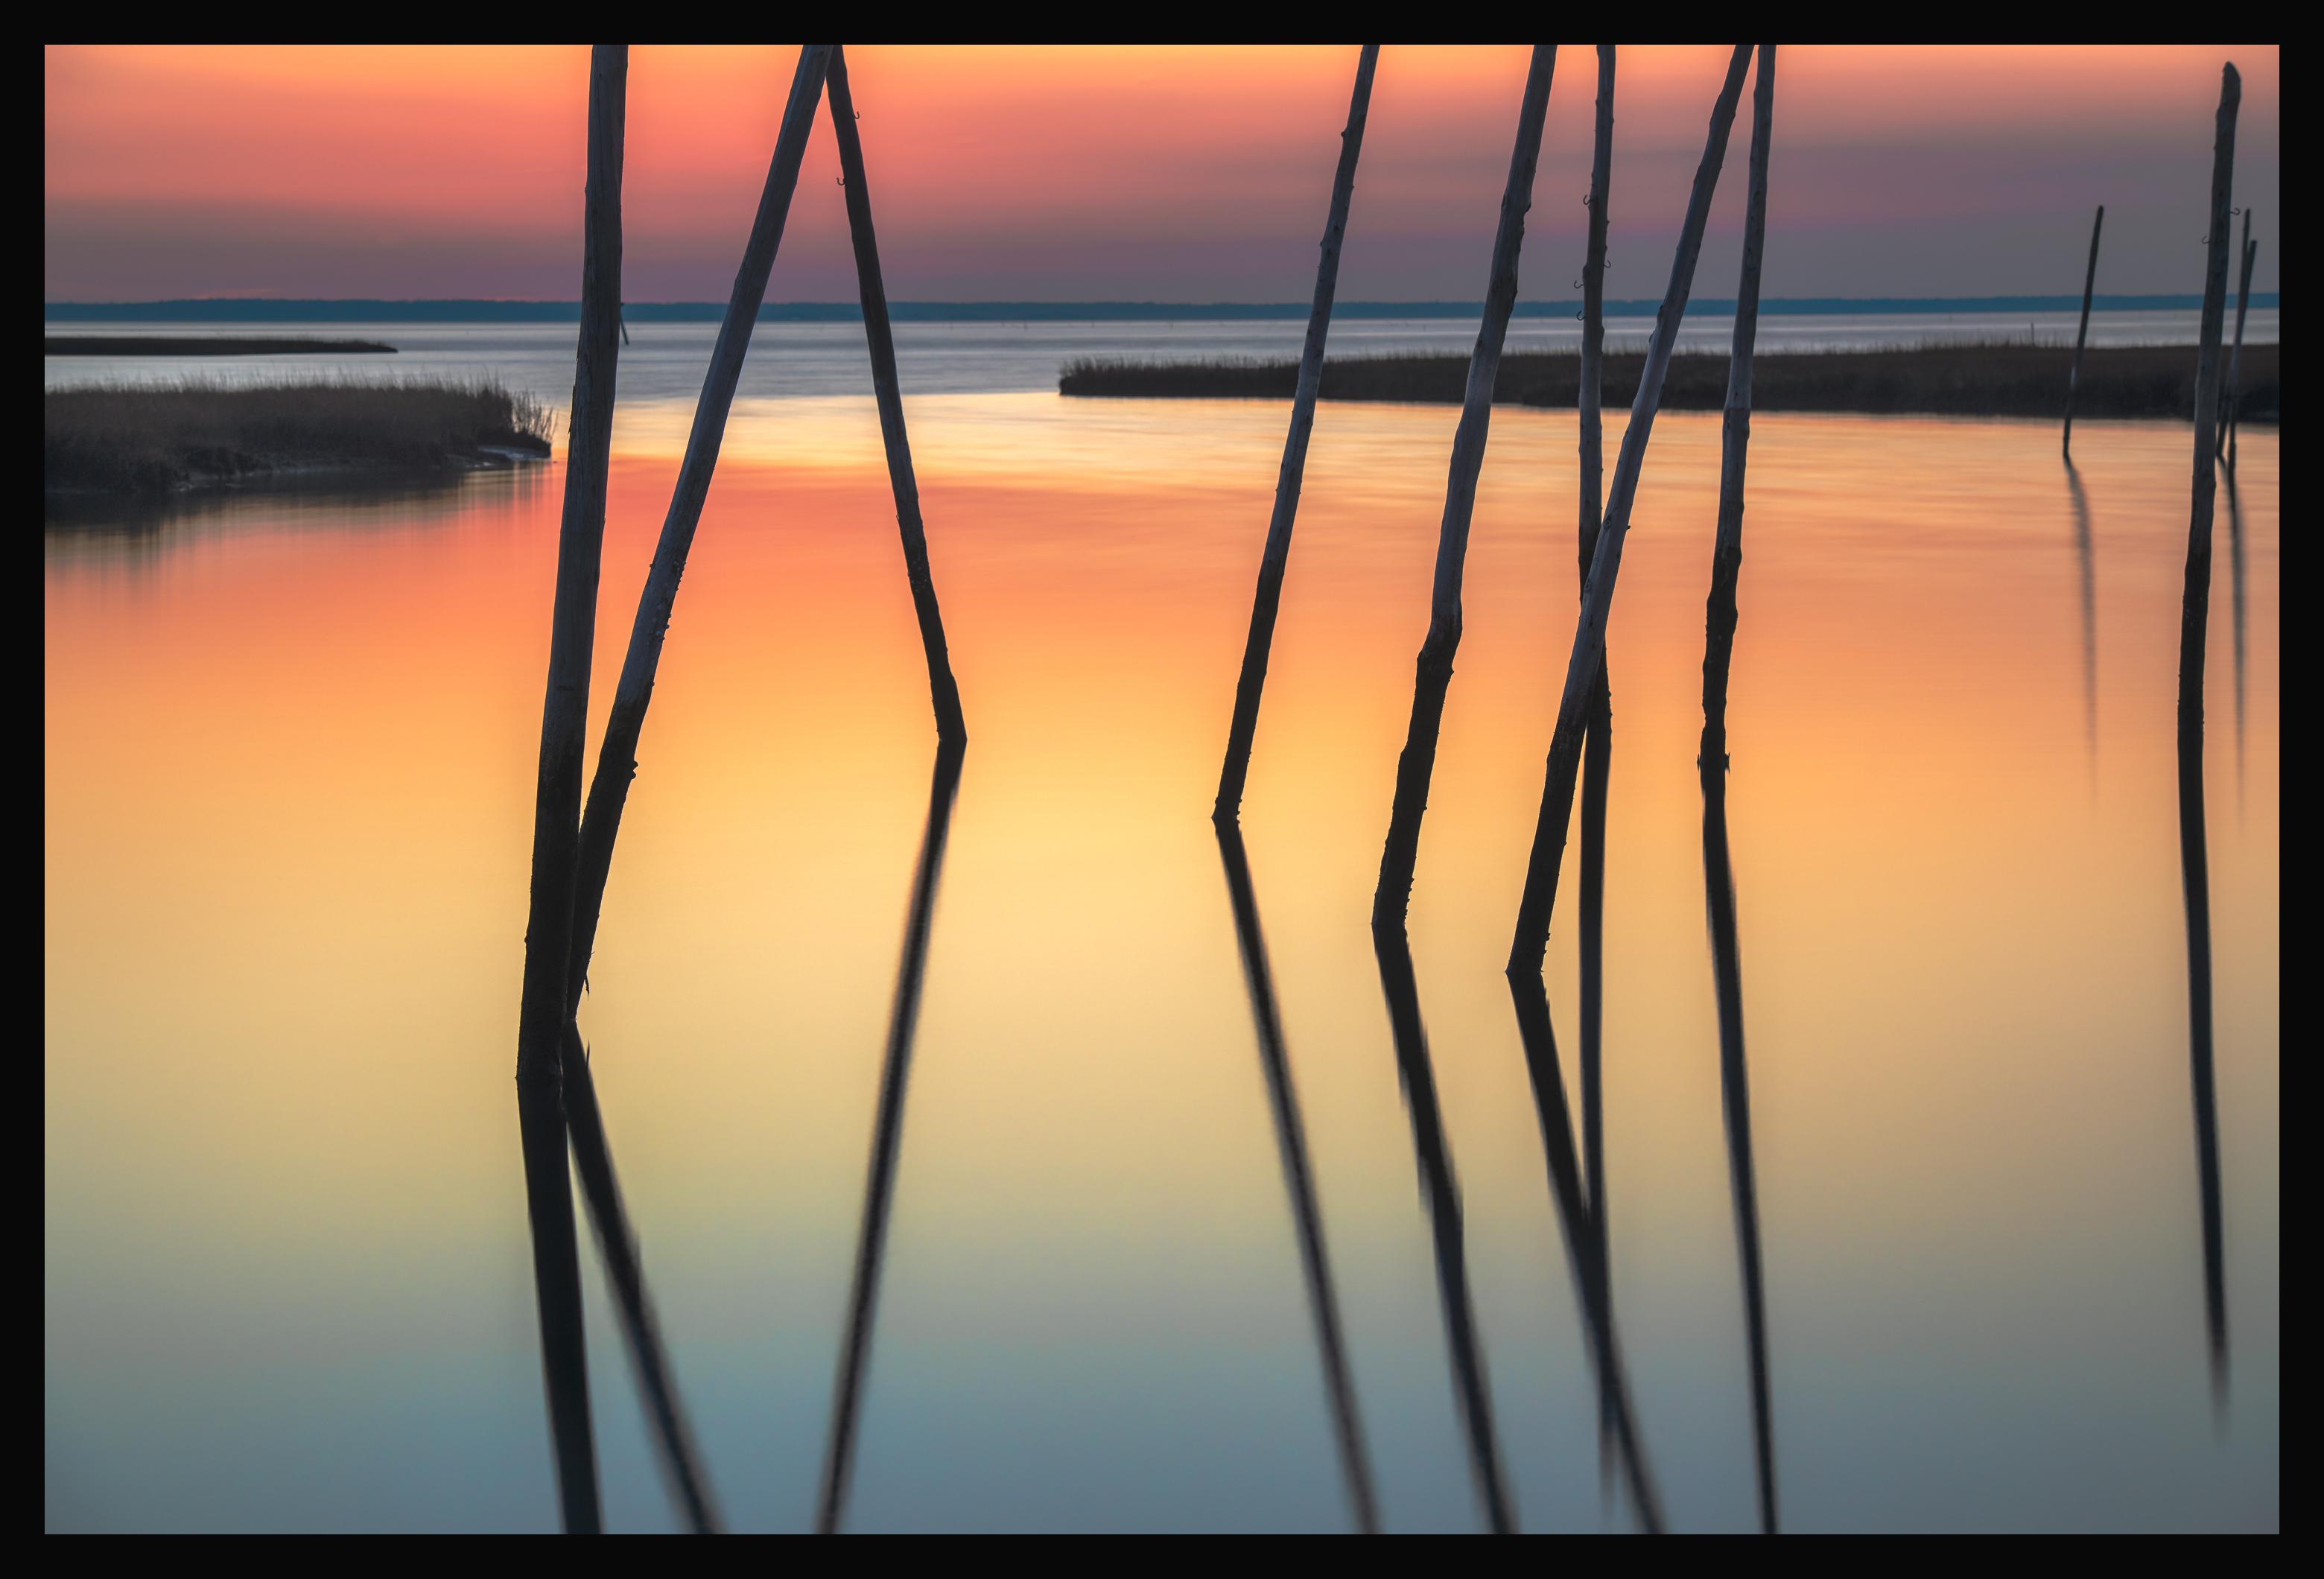 Bayside Reflections